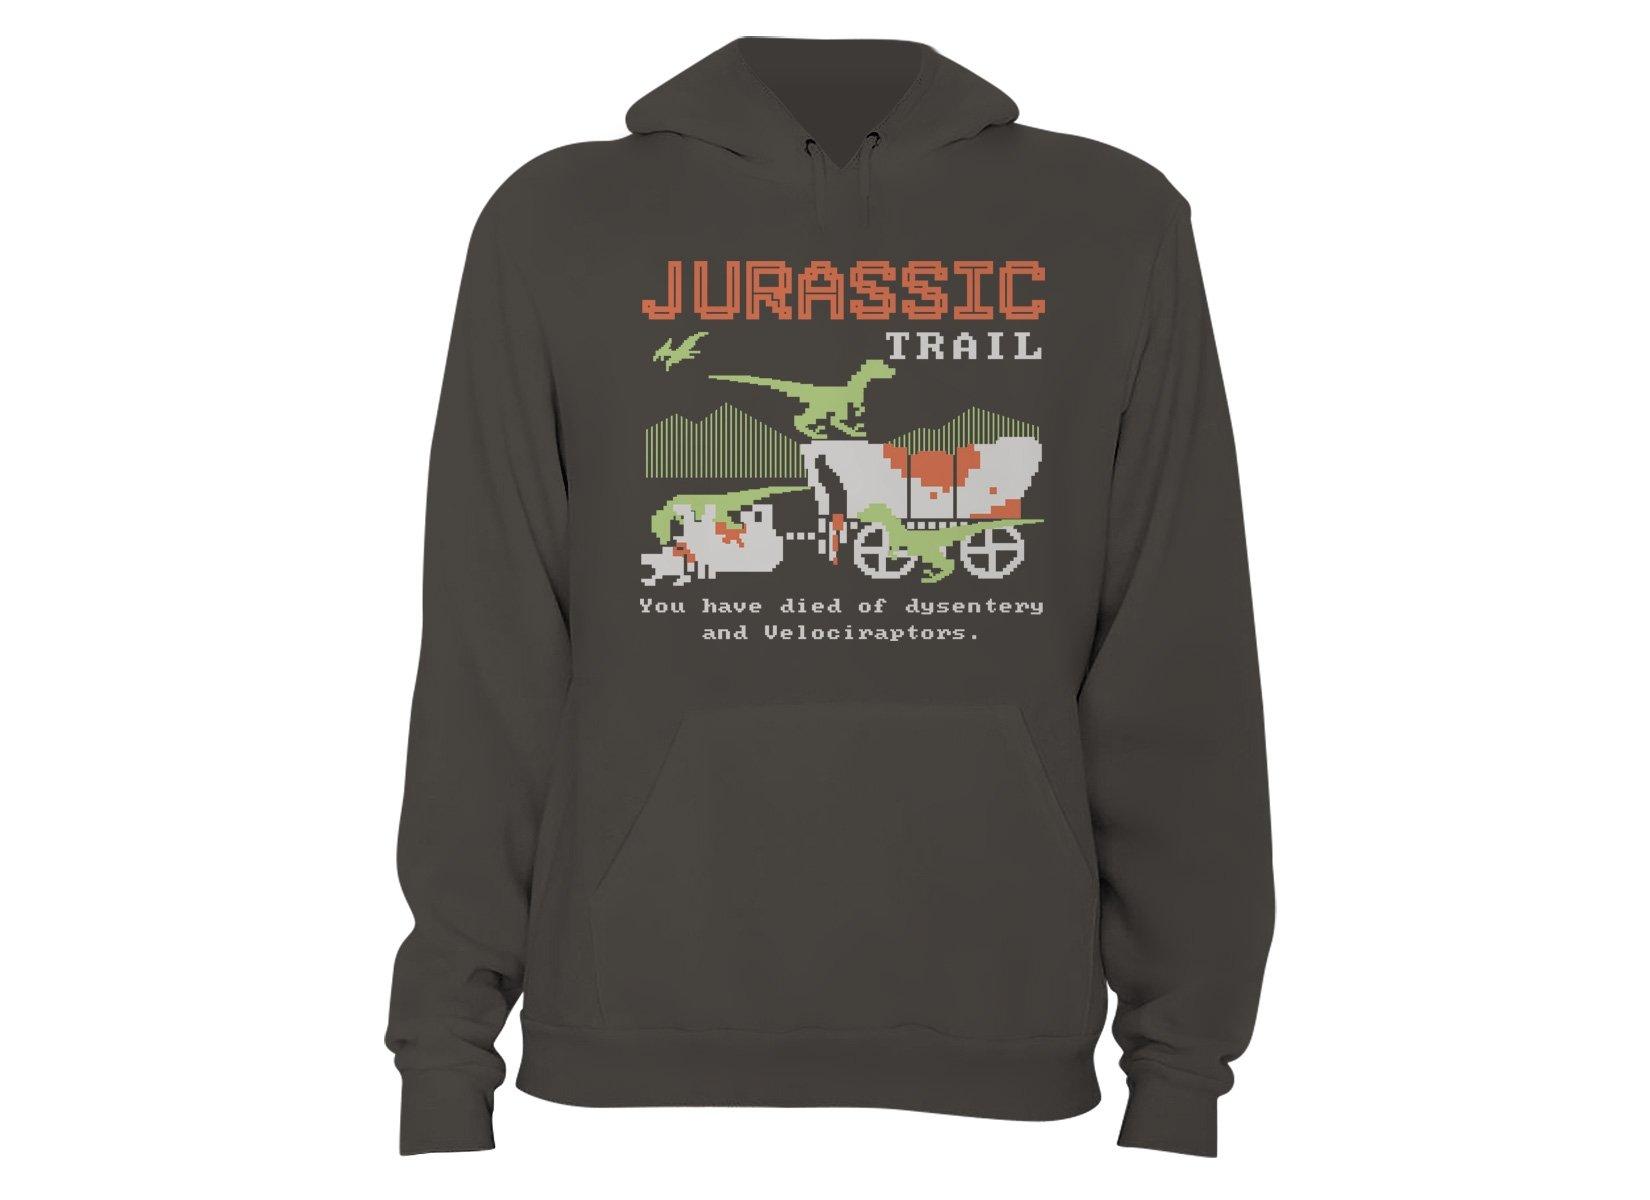 Jurassic Trail on Hoodie